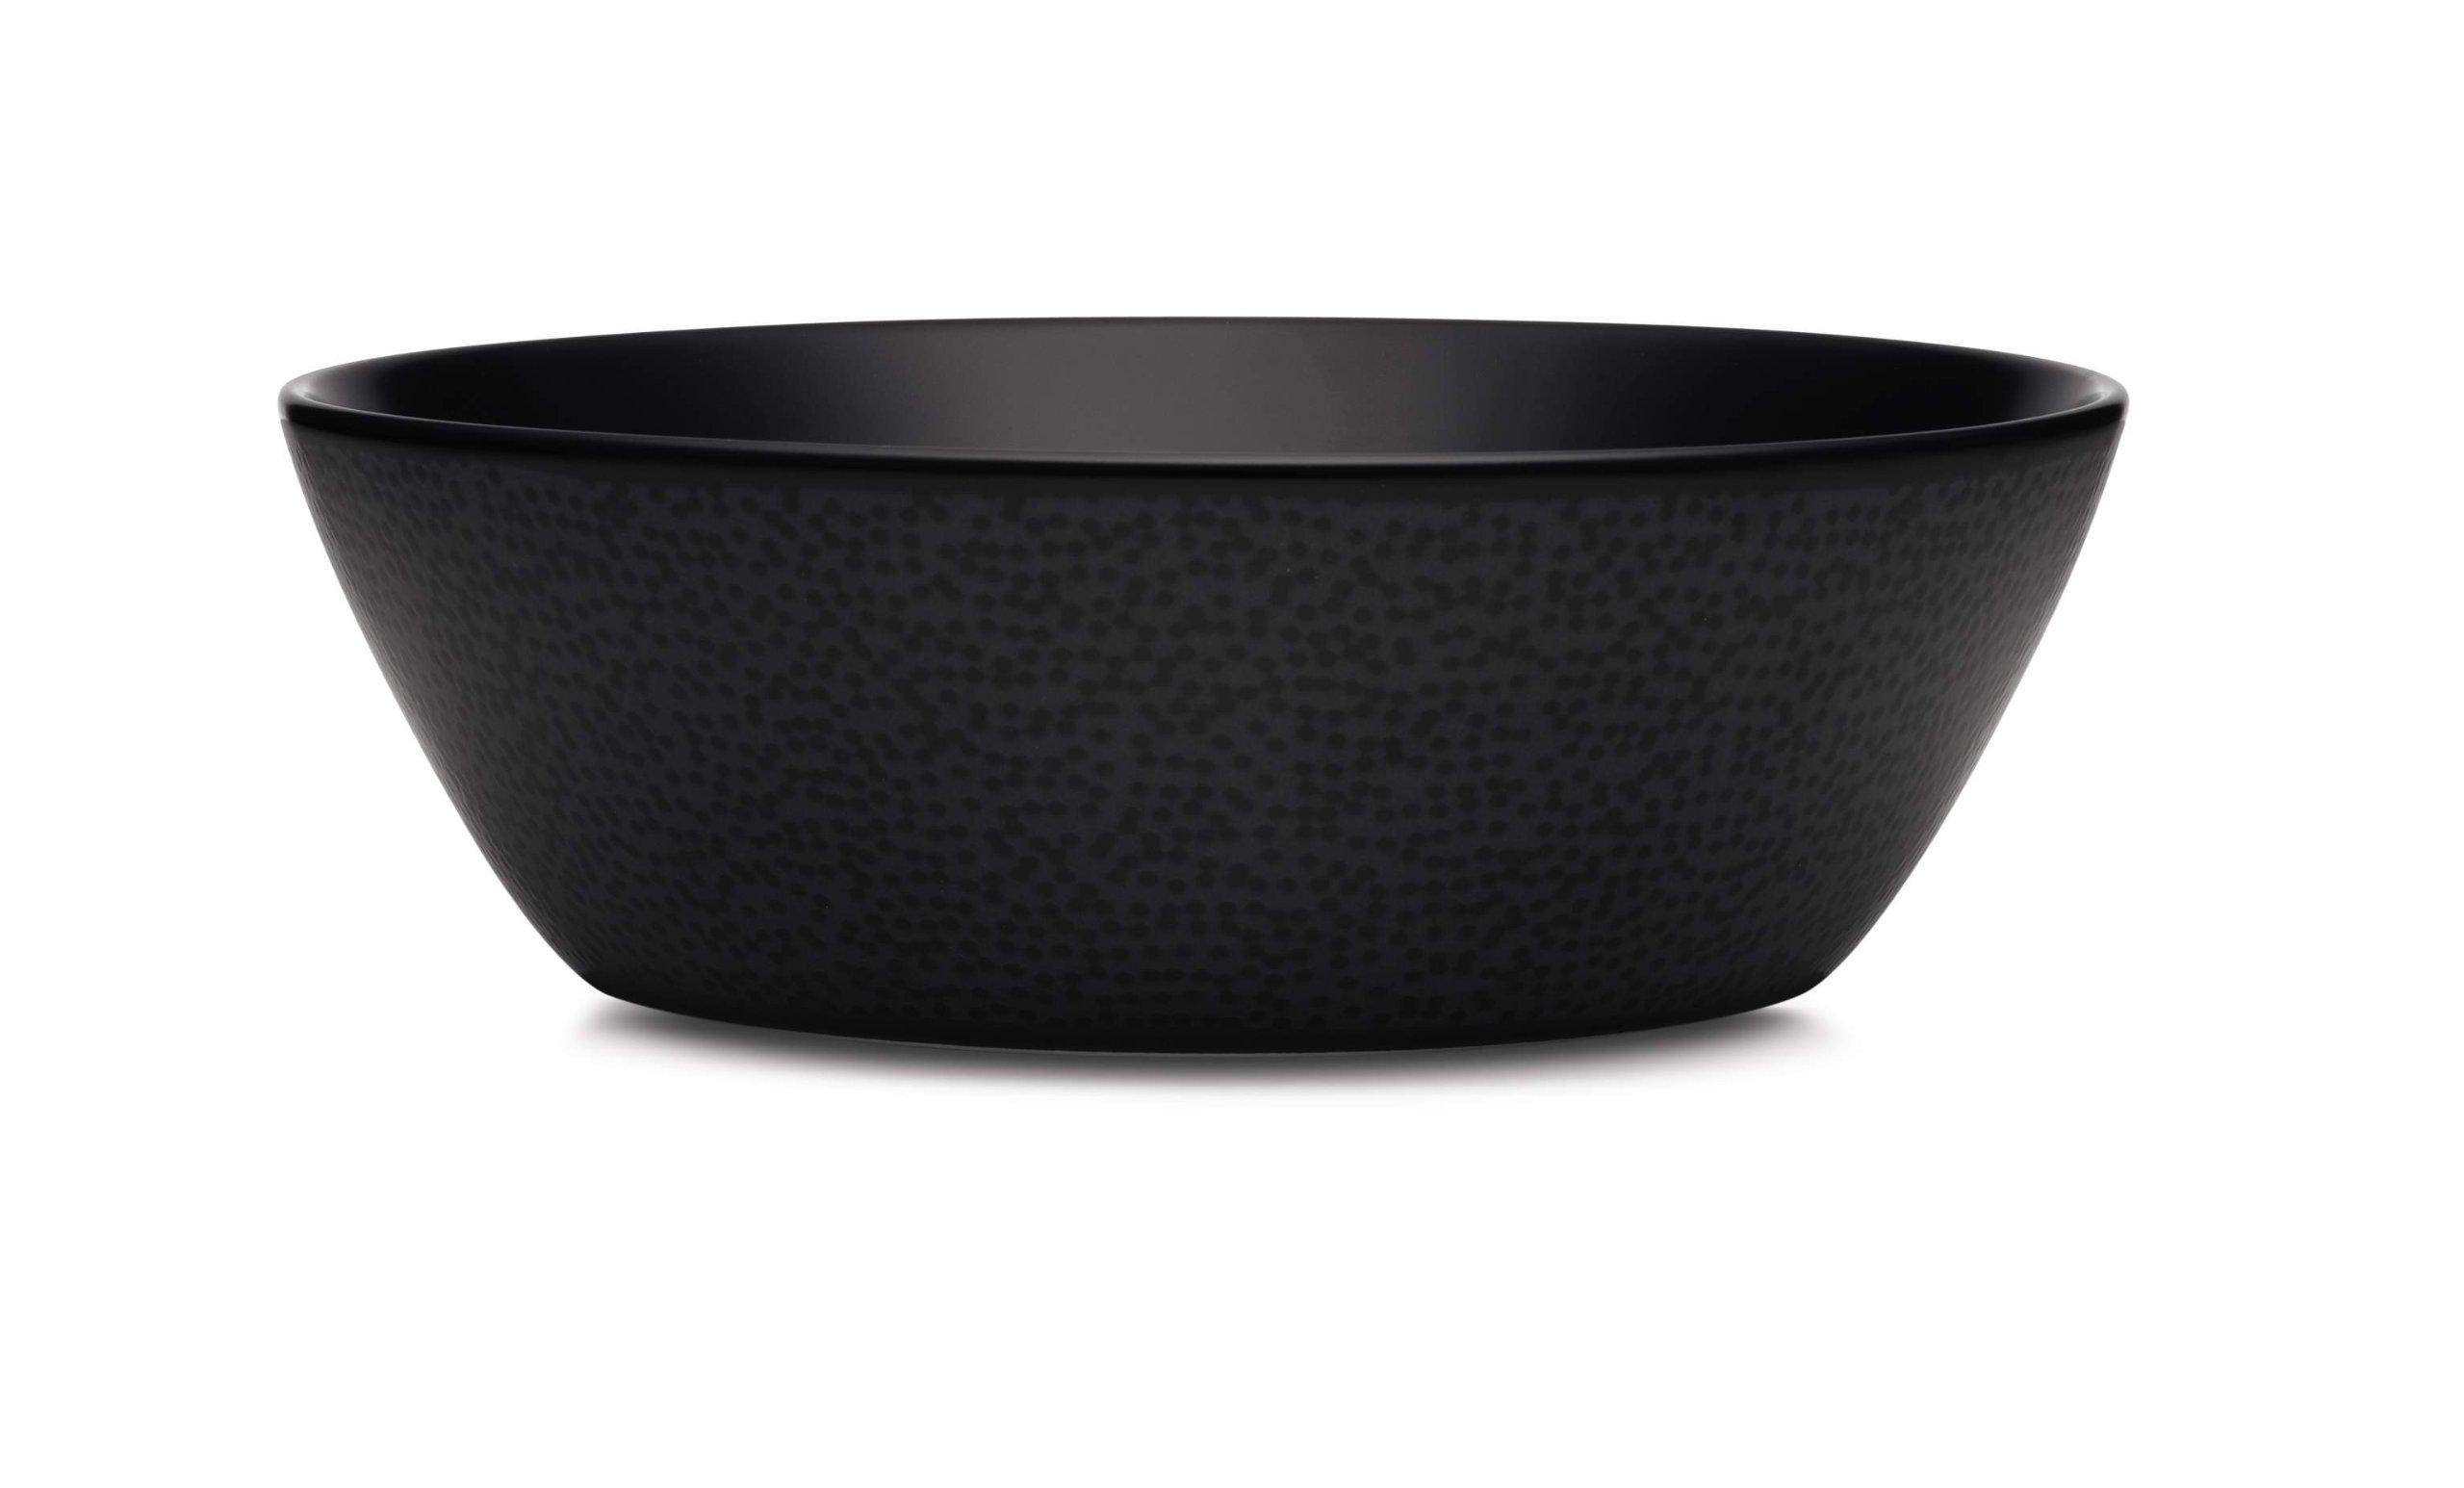 Noritake BOB 90-Ounce Snow Large Round Vegetable/Salad Serving Bowl, 10-1/4-Inch